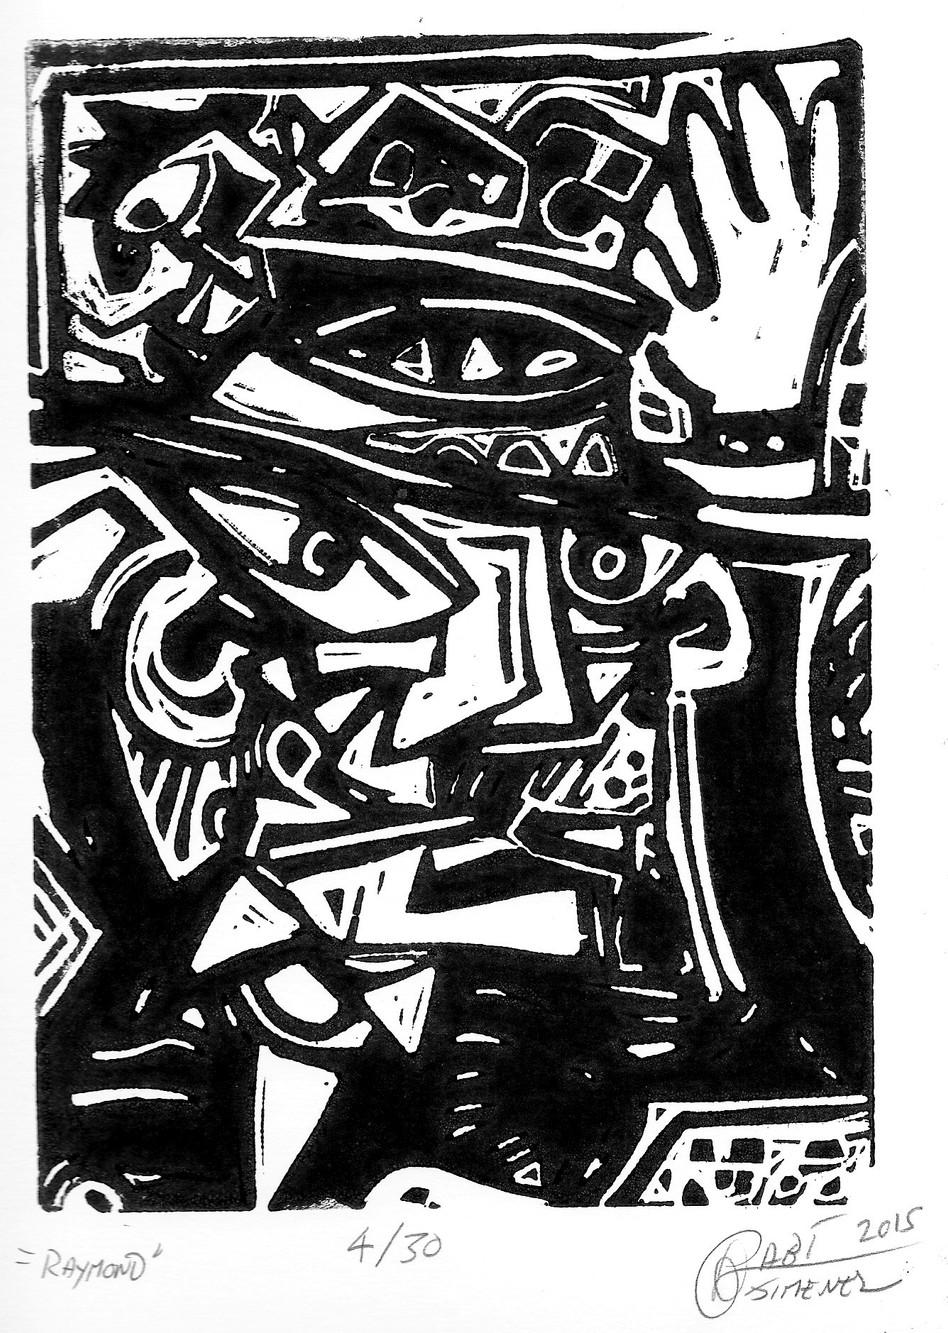 Gravure Raymond Gurème